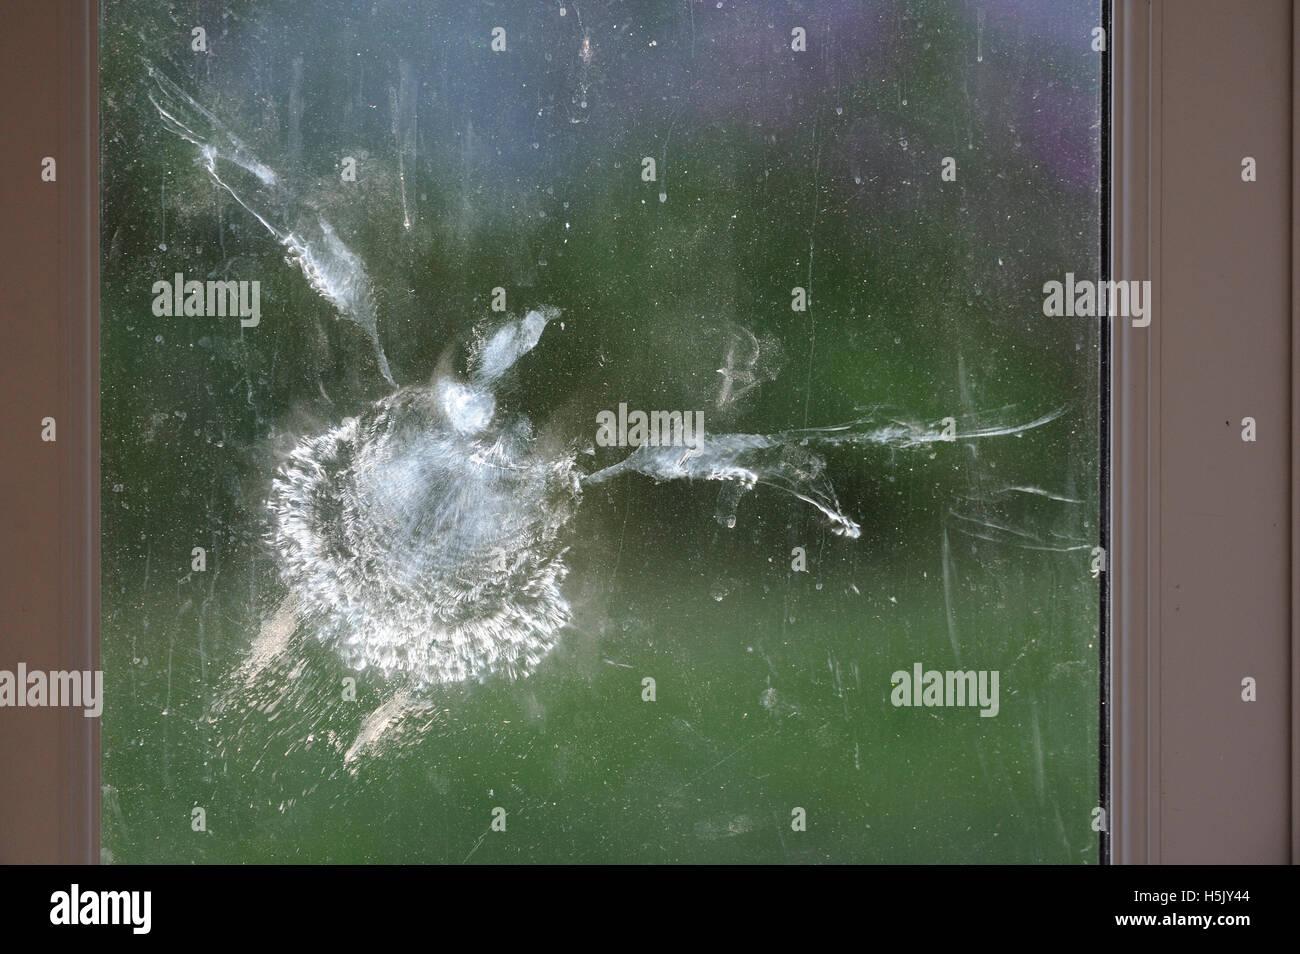 Outline of bird, woodpigeon, left on window, a feather dust imprint left on window pane - Stock Image